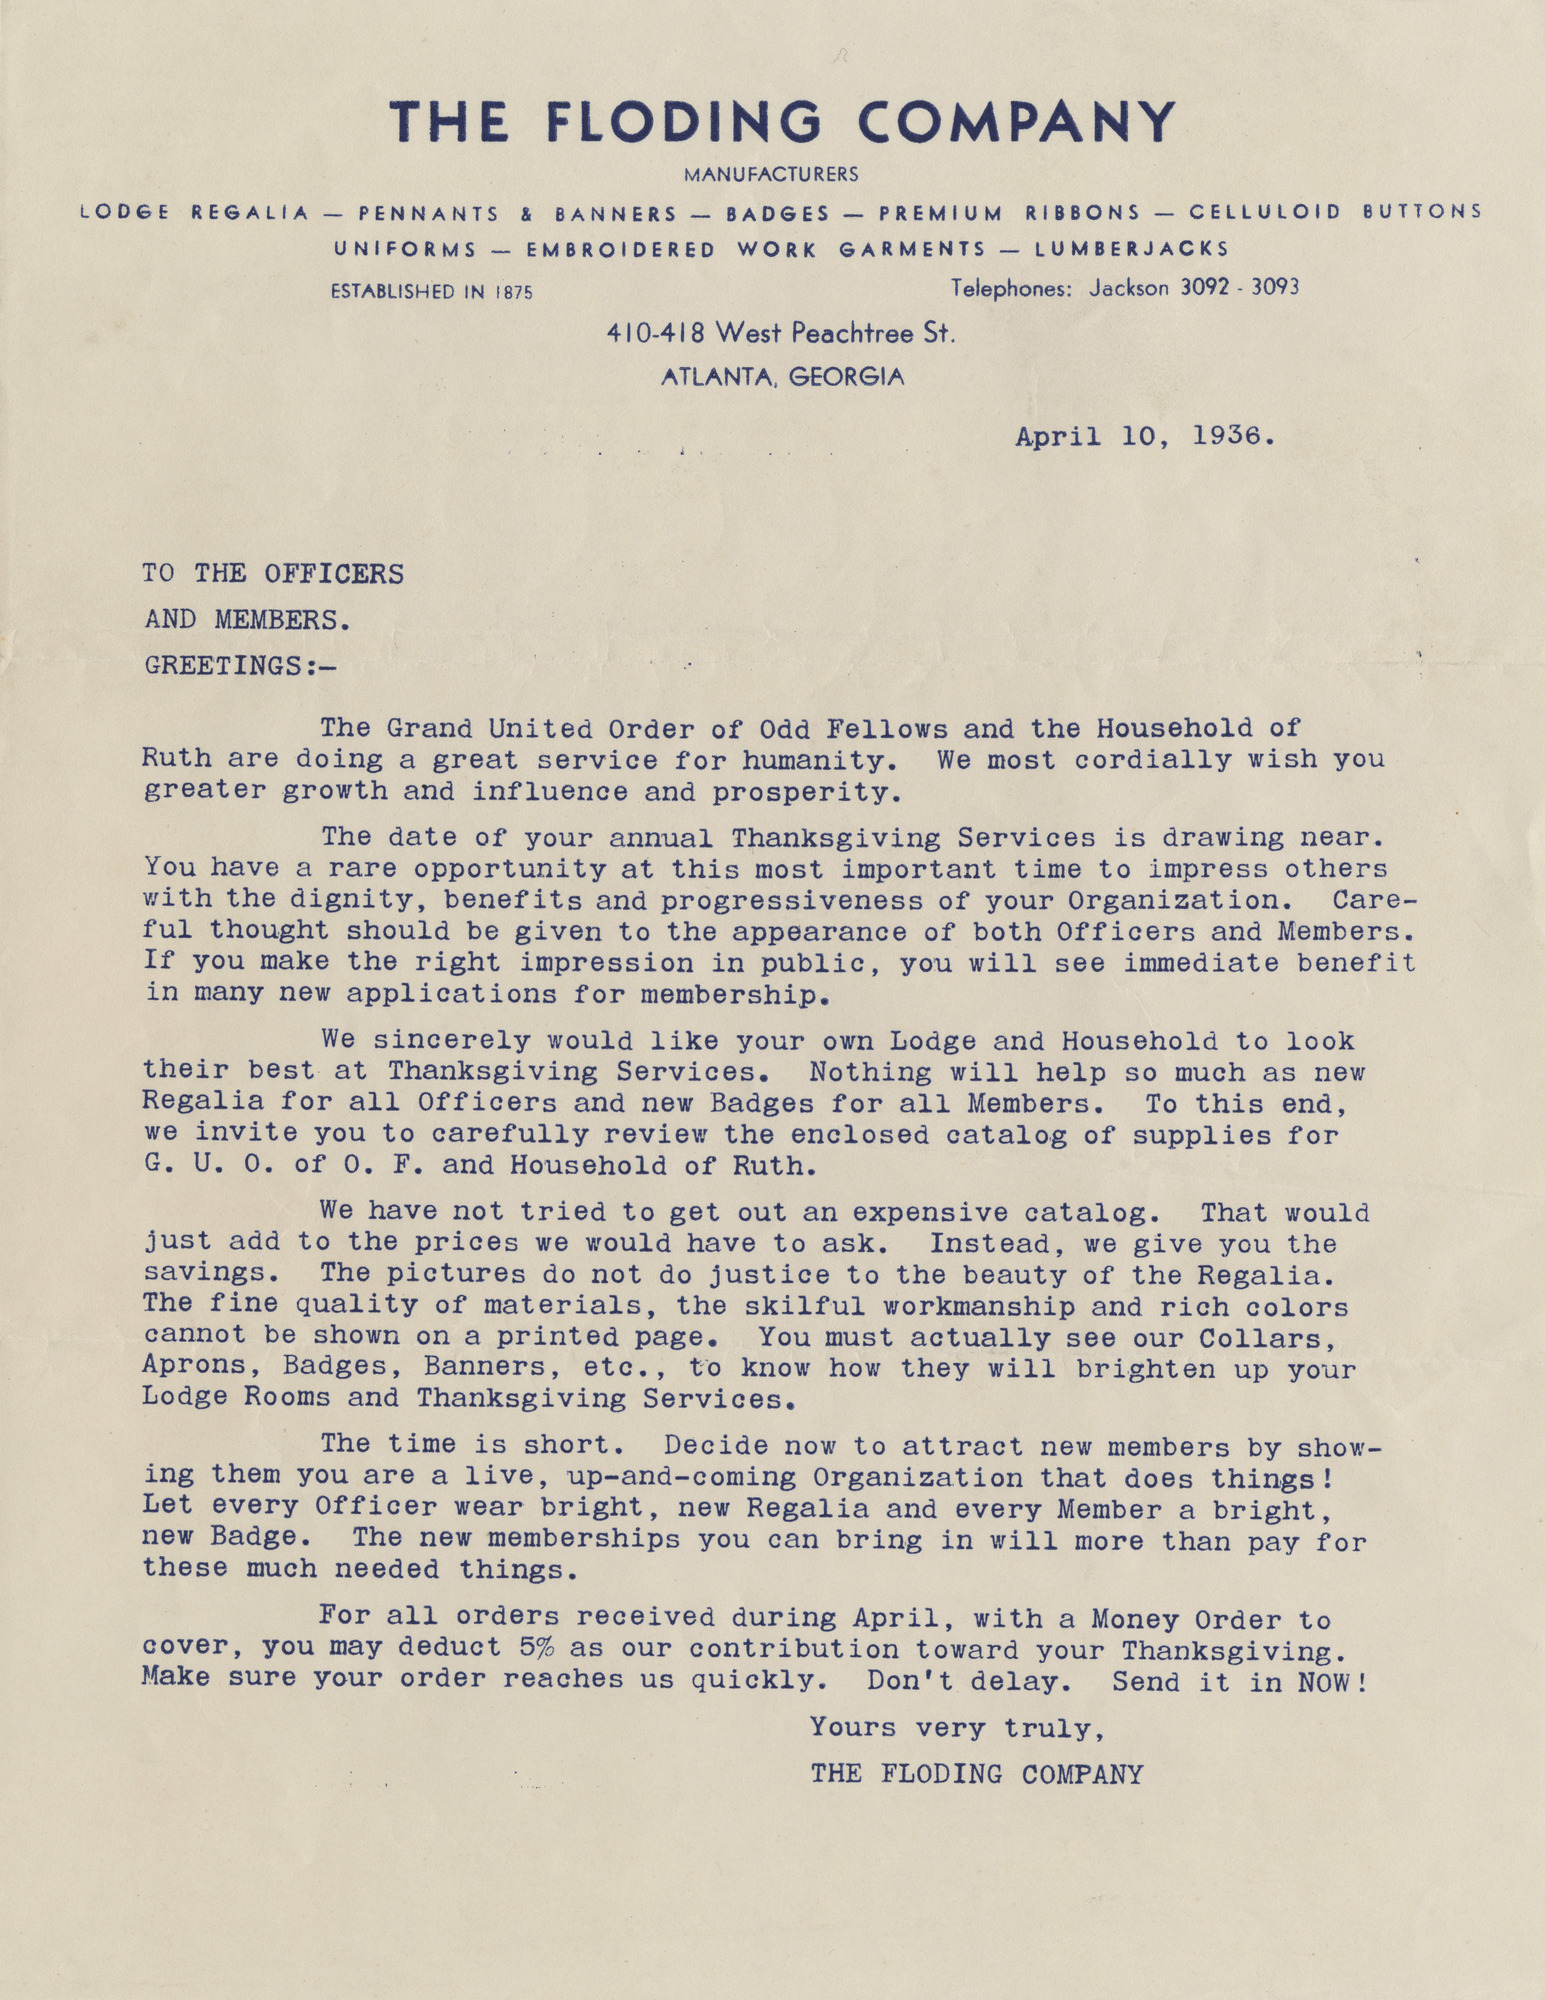 Ms1988-009_OddFellows_B1F57_Letter_1936_0410.jpg